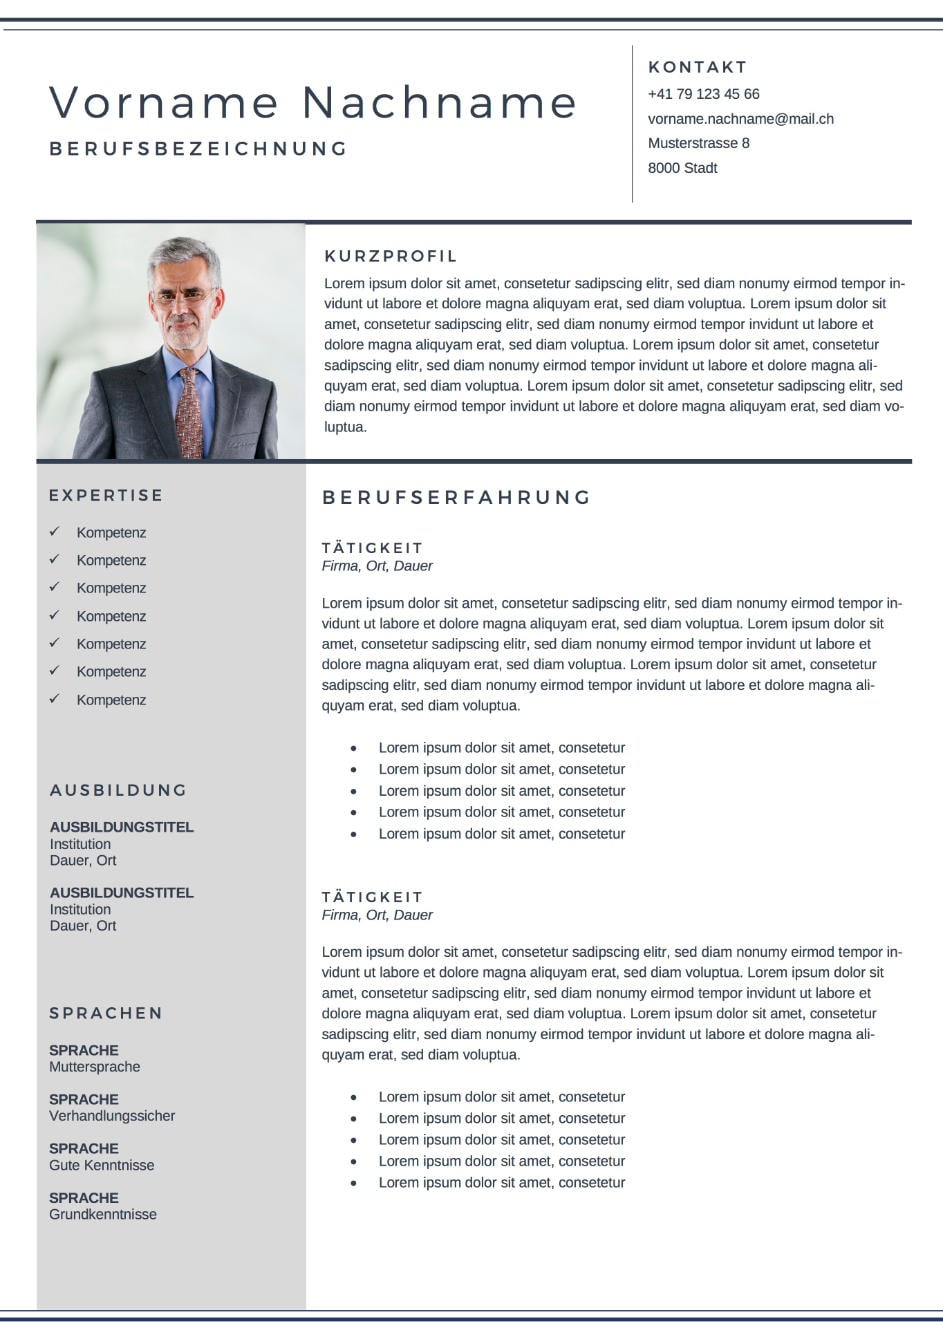 Bewerbung Vorlage Executive